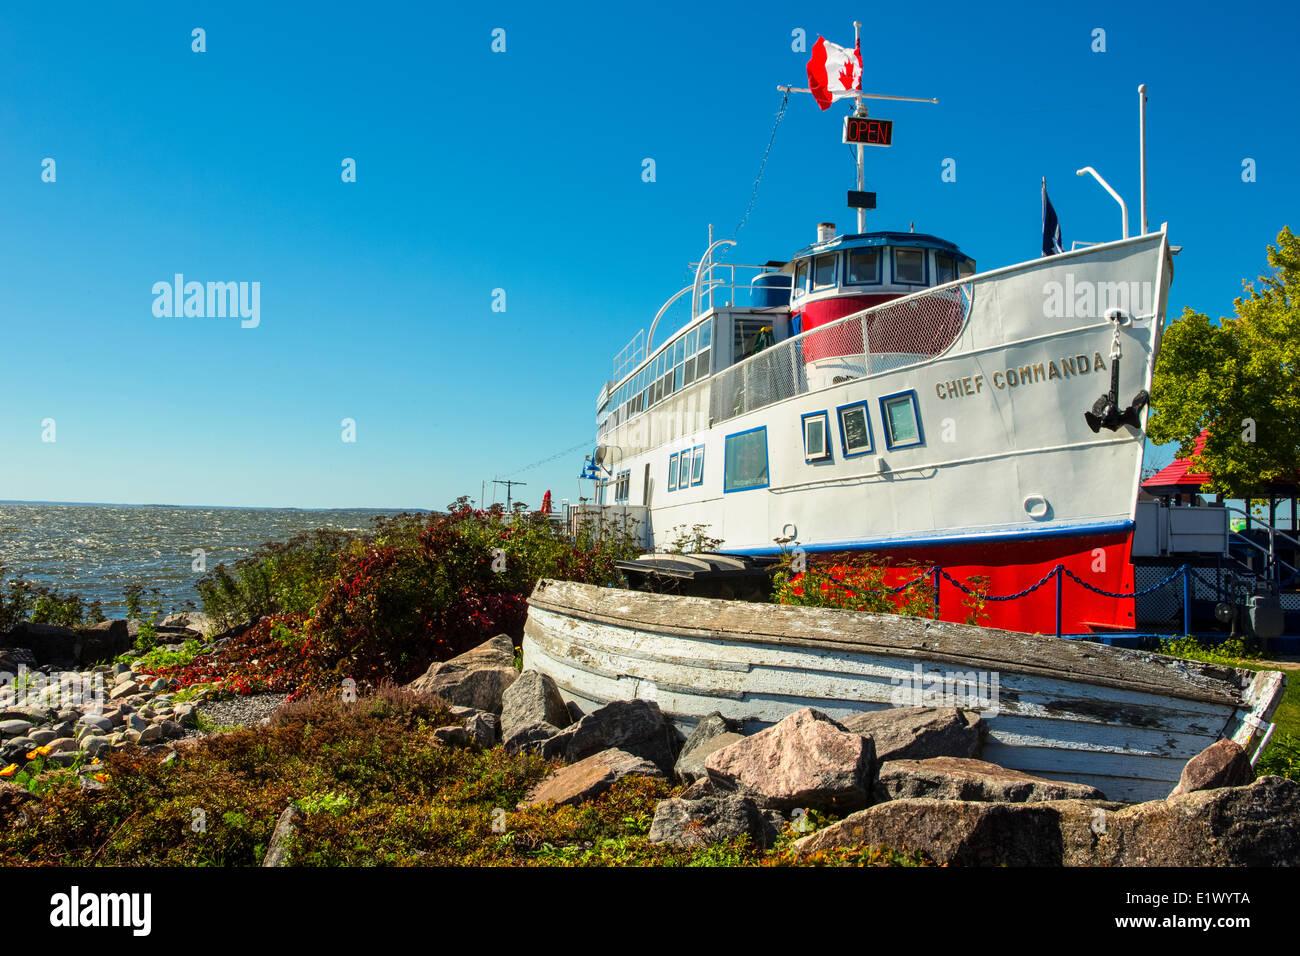 Bateau d'excursion, chef Commanda, du secteur riverain, Ontario, Canada Photo Stock